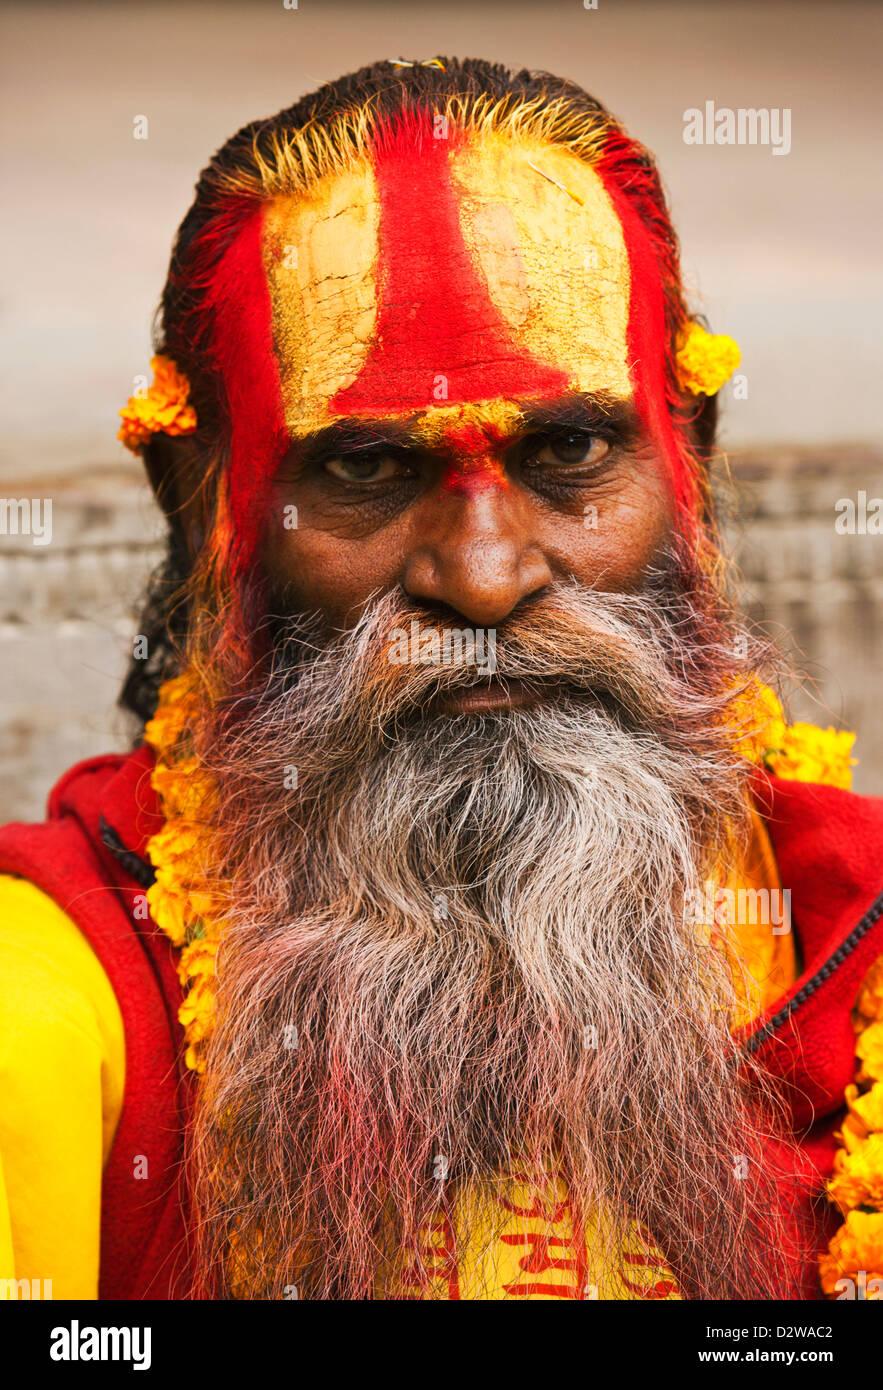 Sadhu (holy Men) at the Pashupatinath temple in Kathmandu, Nepal. - Stock Image